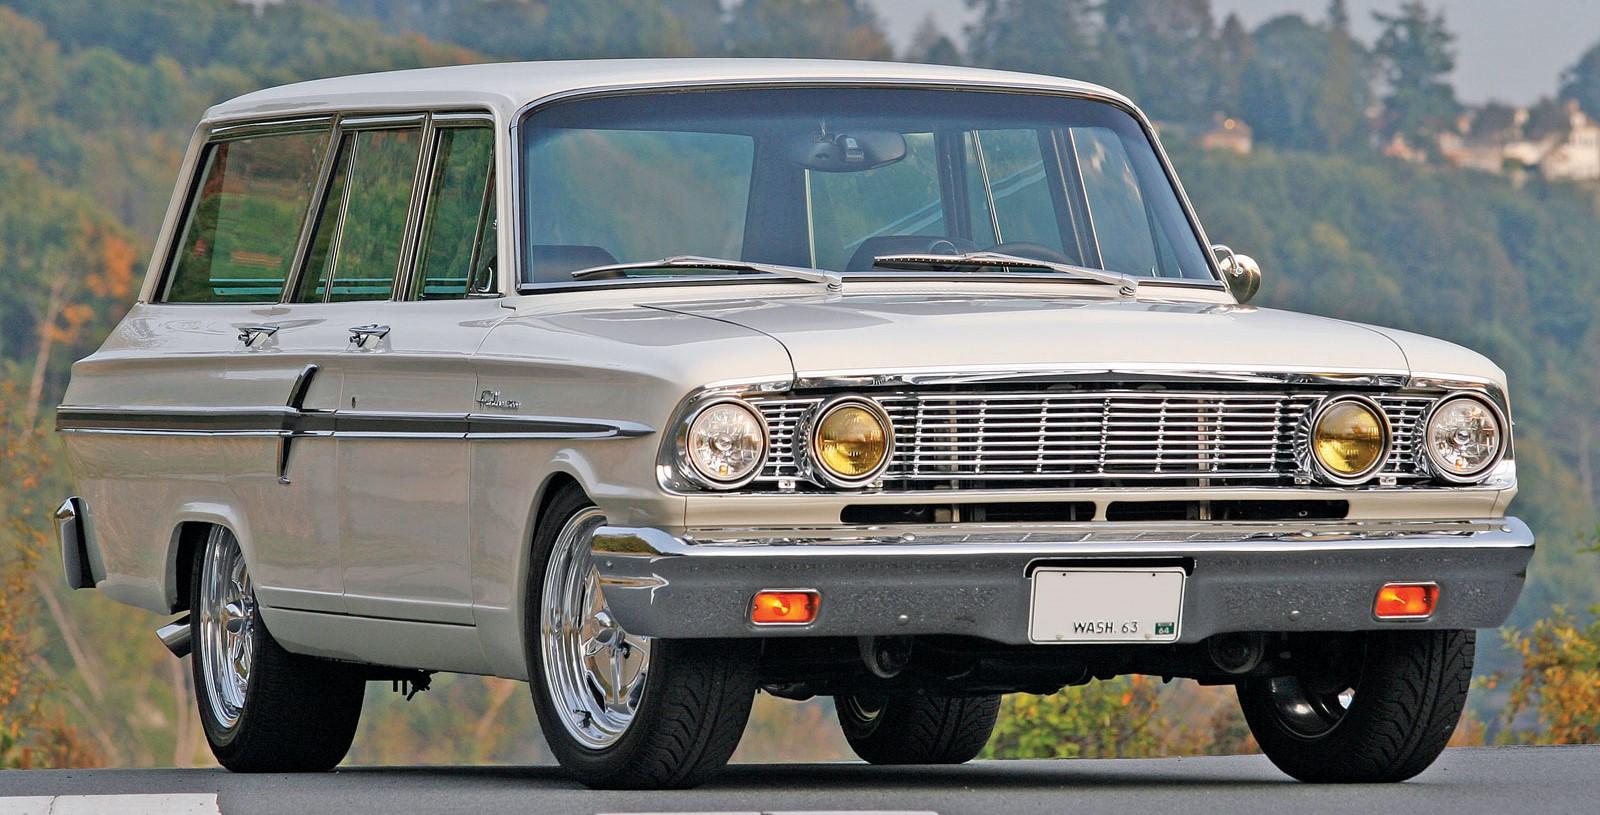 64-fairlane-wagon.jpg